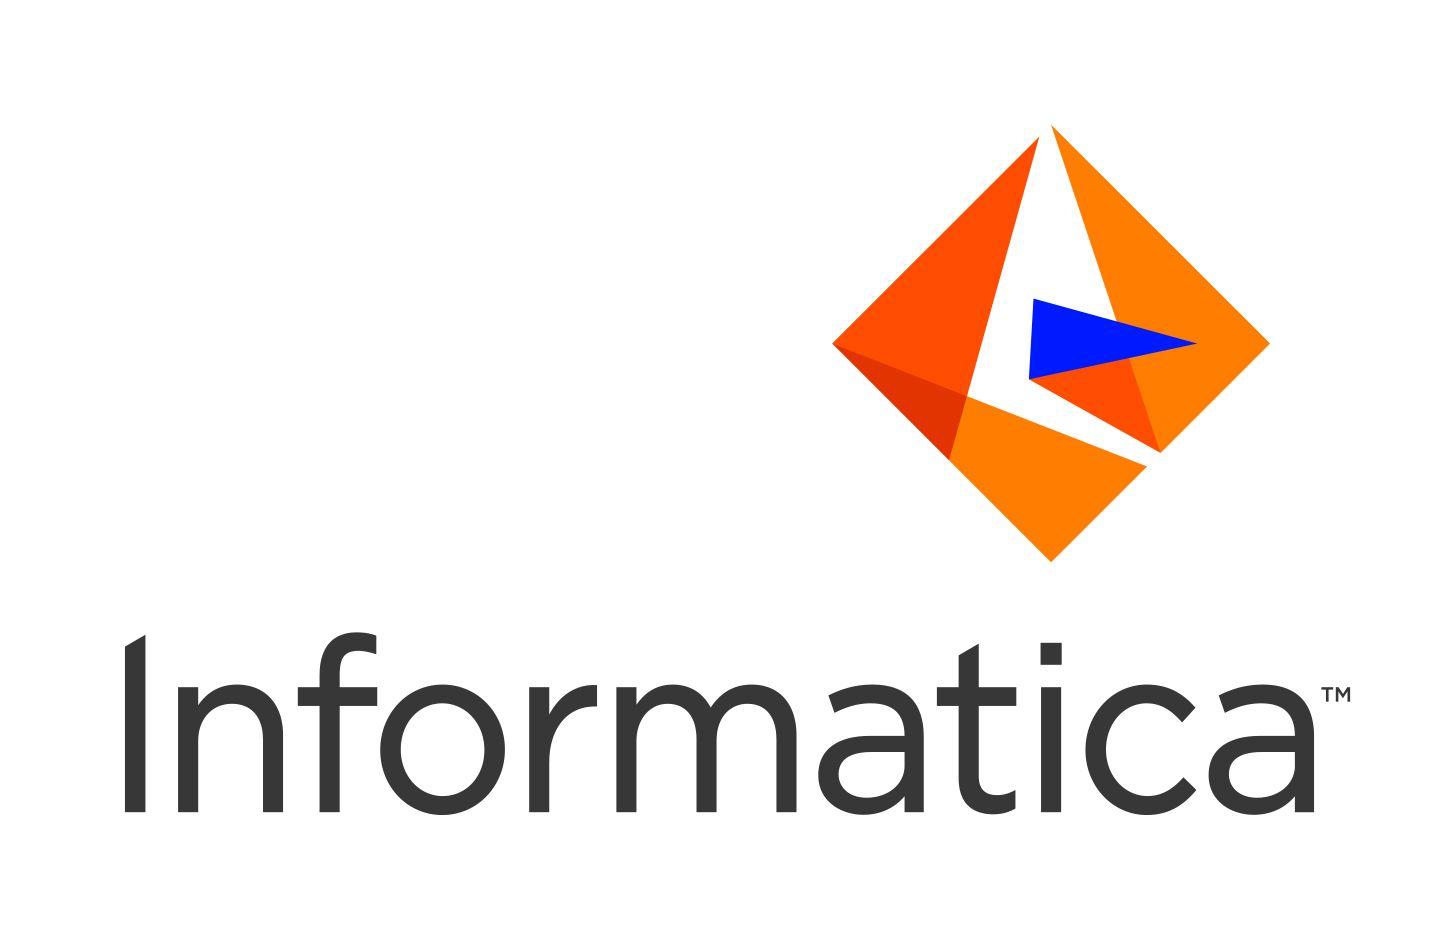 Informatica.jpg